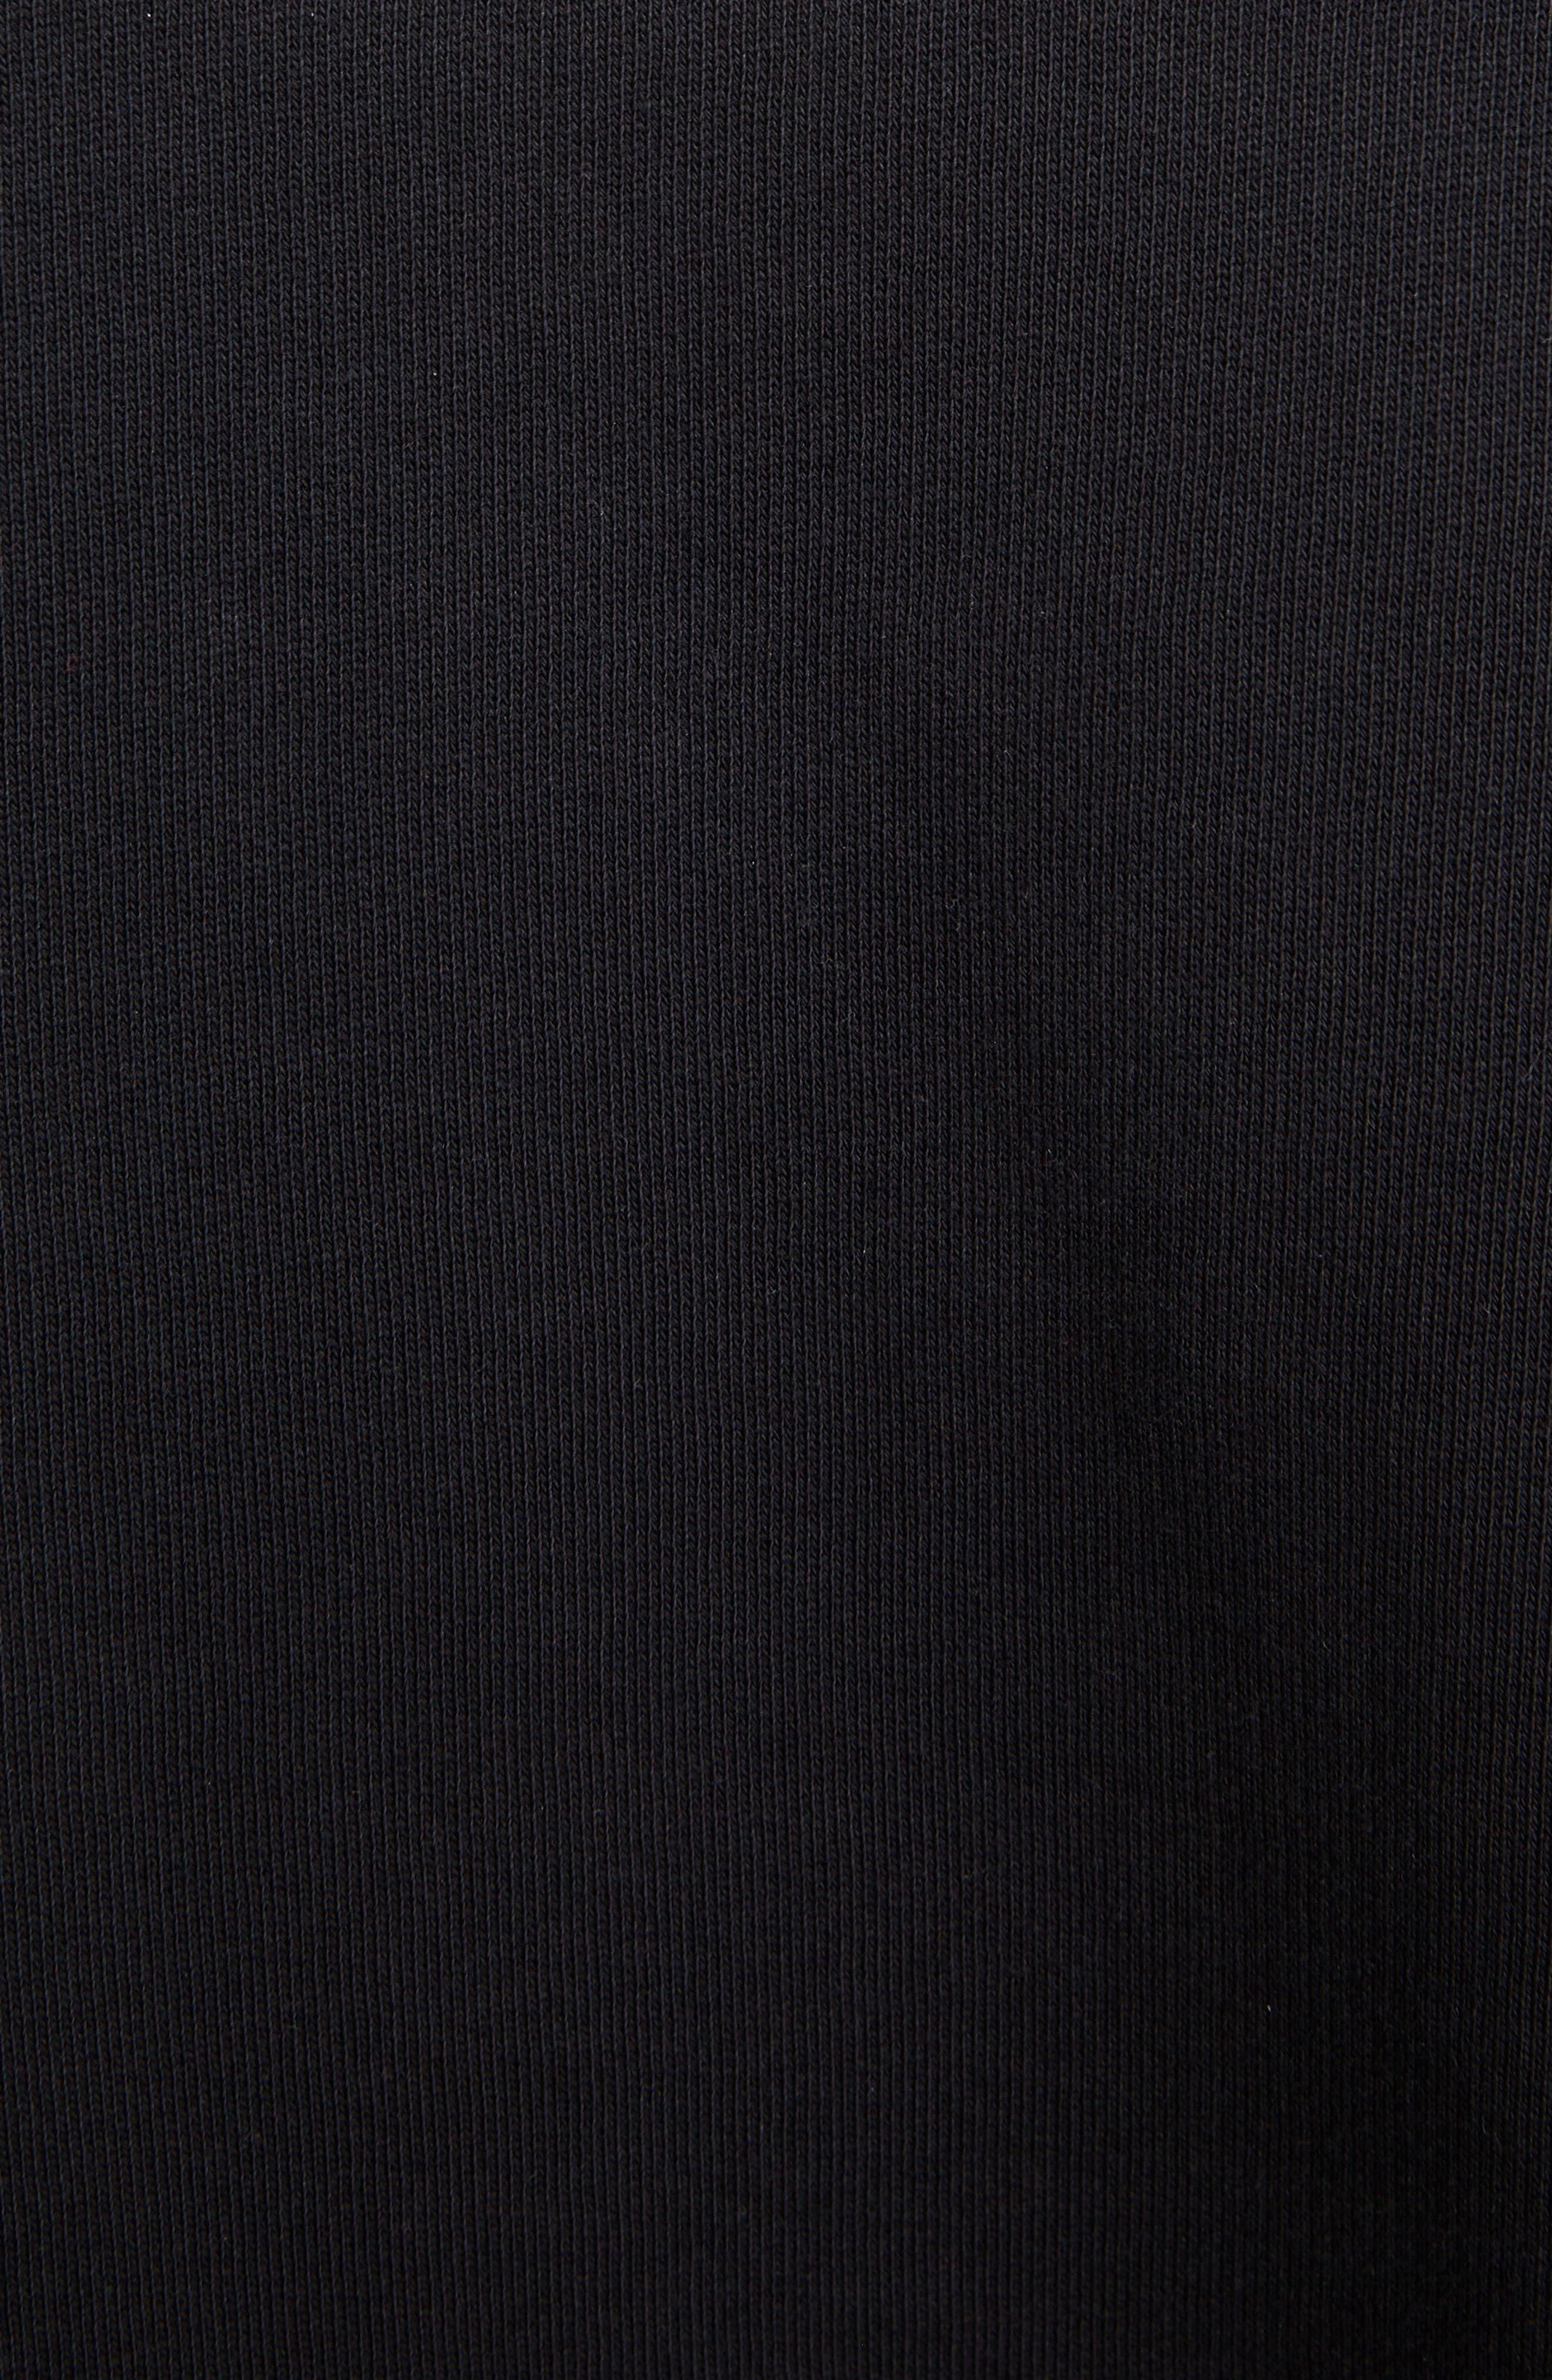 Dragon Tiger Crewneck Sweatshirt,                             Alternate thumbnail 5, color,                             BLACK